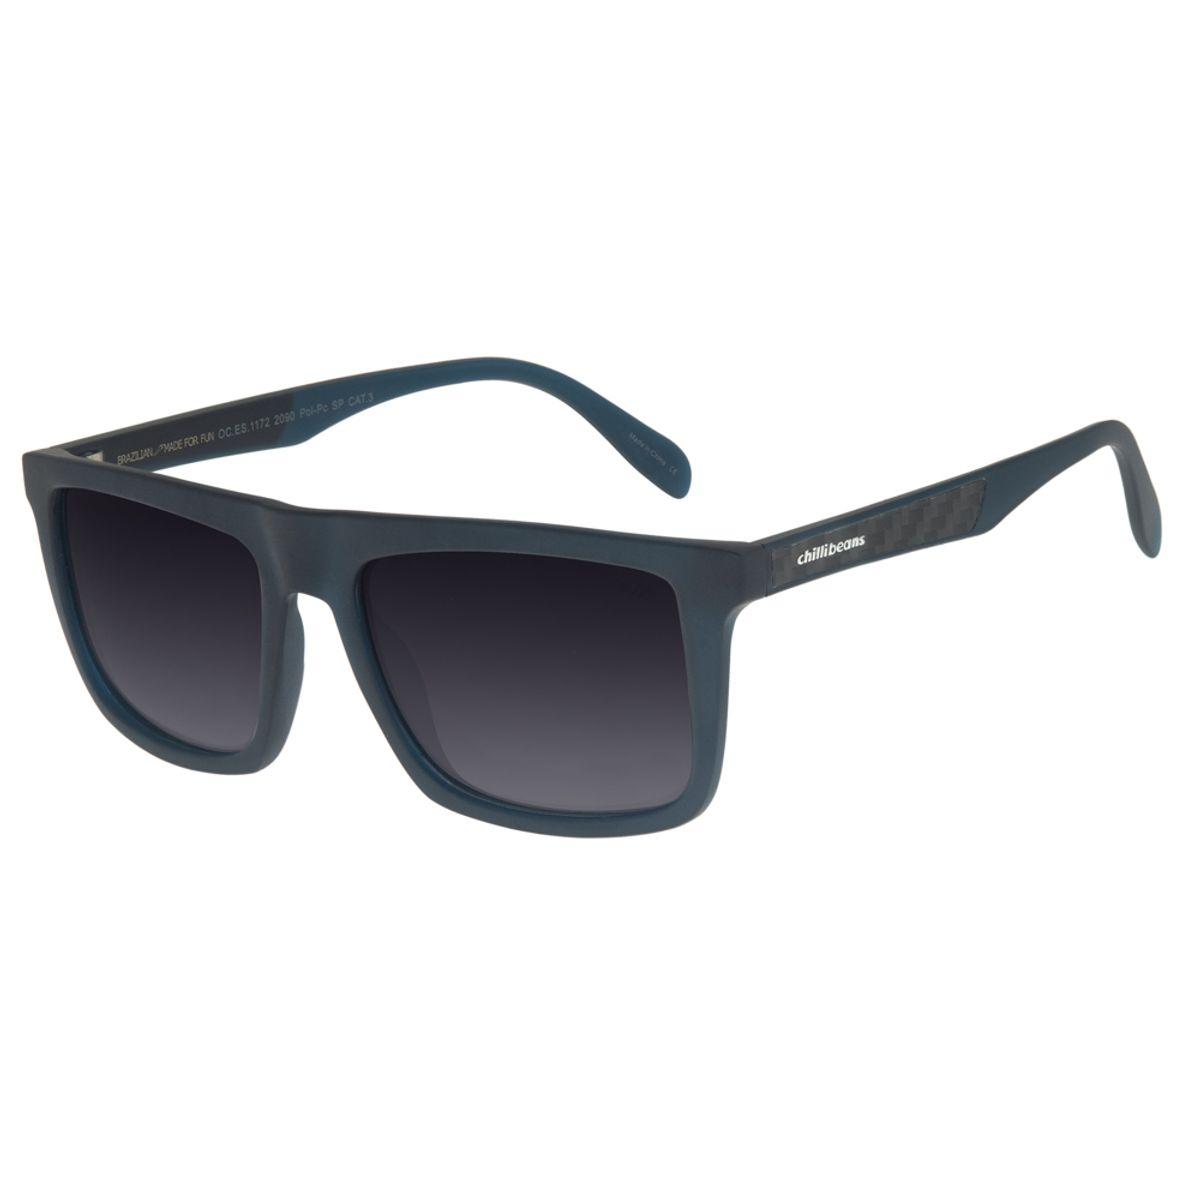 2bbf2e0ae Óculos de Sol Esportivo Masculino Chilli Beans Azul Polarizado 1172 -  OC.ES.1172.2090 M. REF: OC.ES.1172.2090. OC.